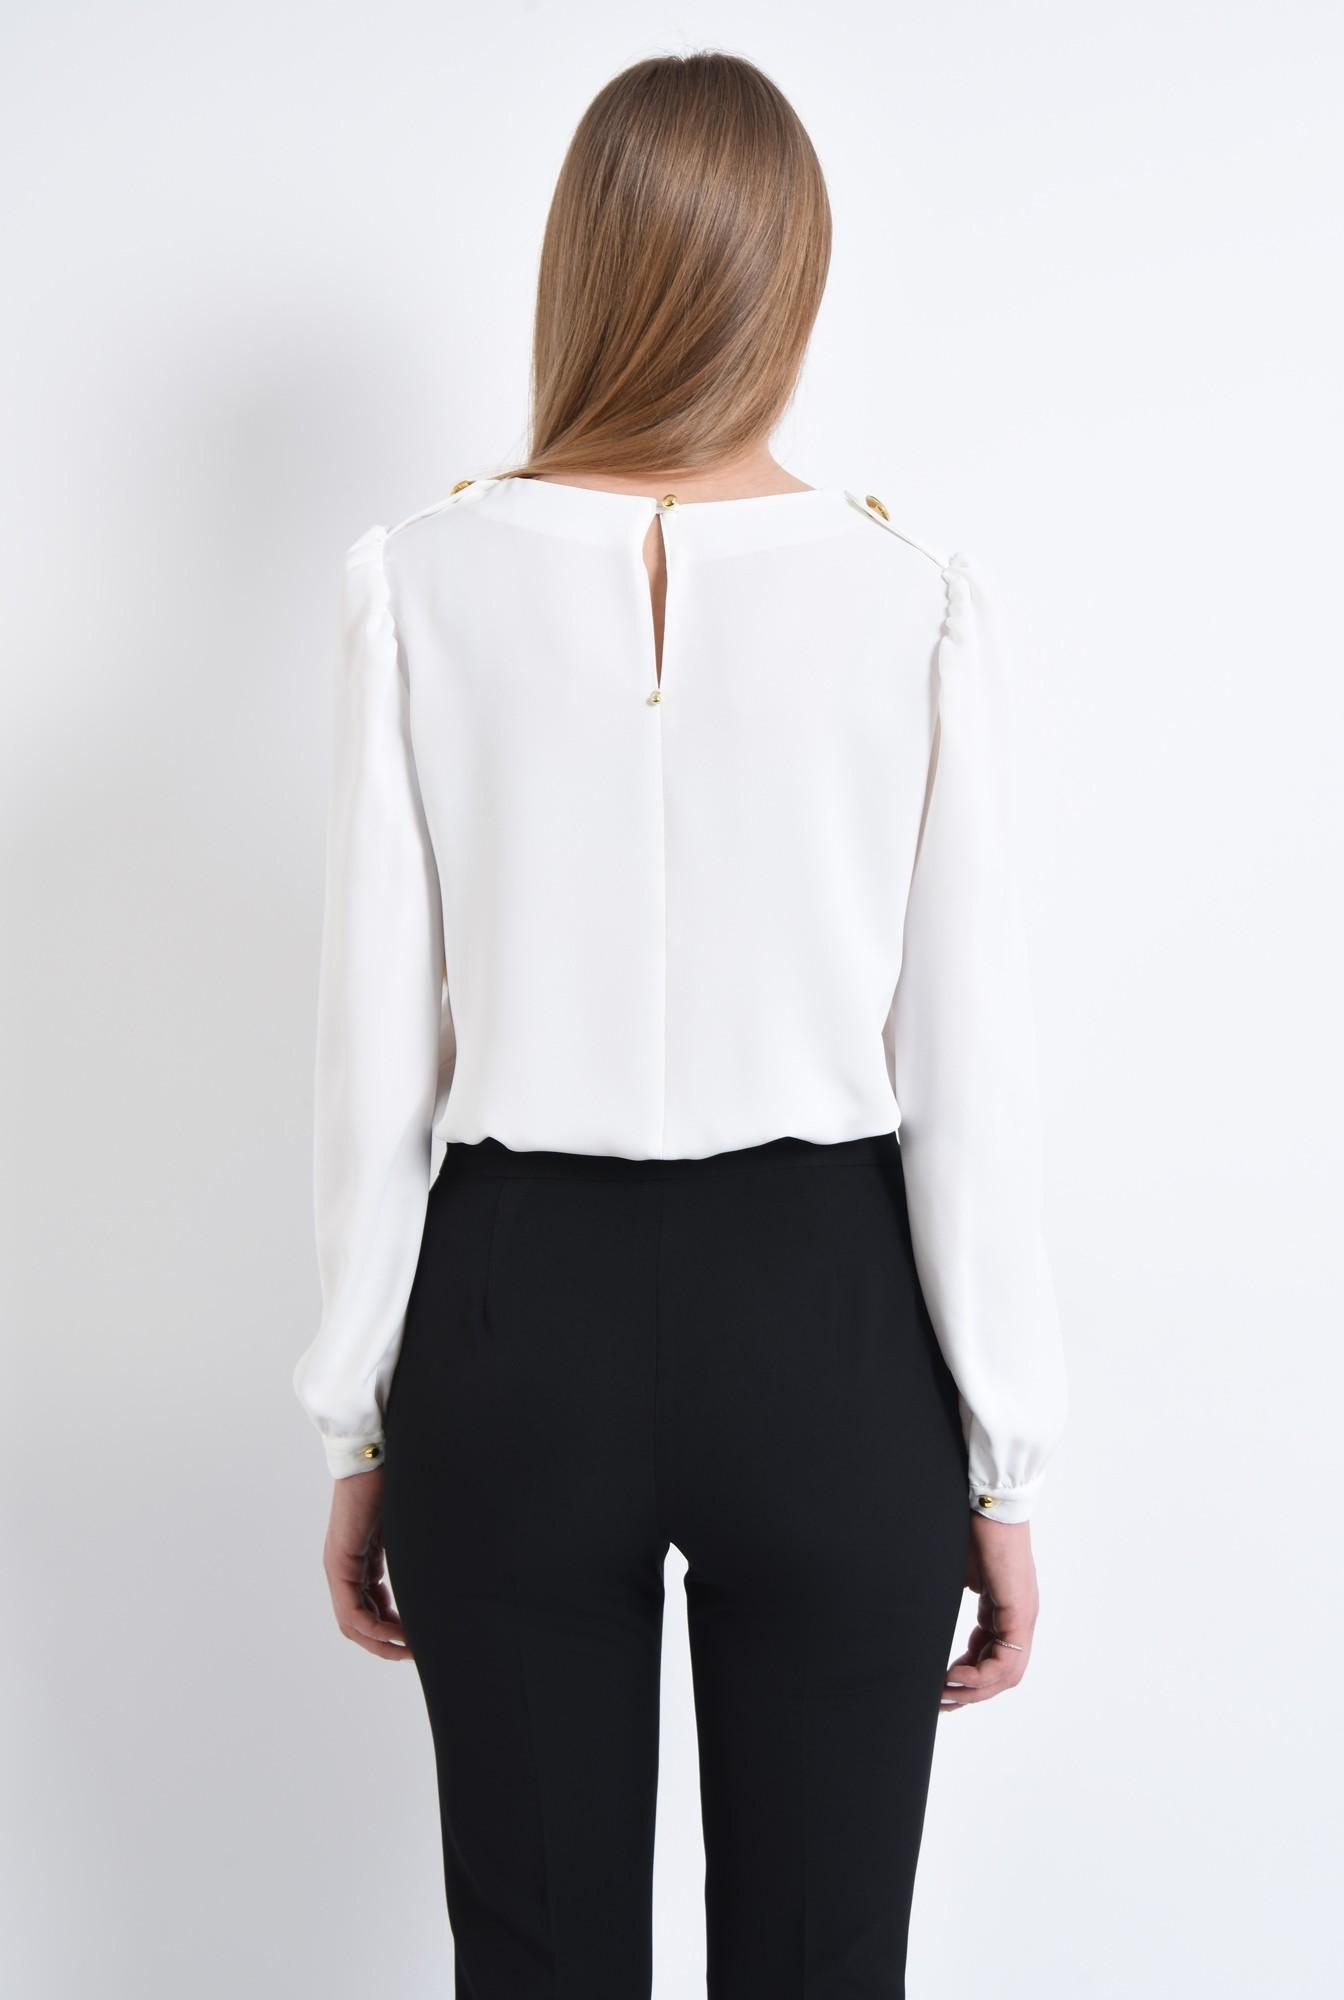 1 - bluza casual, dreapta, crep, epoleti, nasturi decorativi